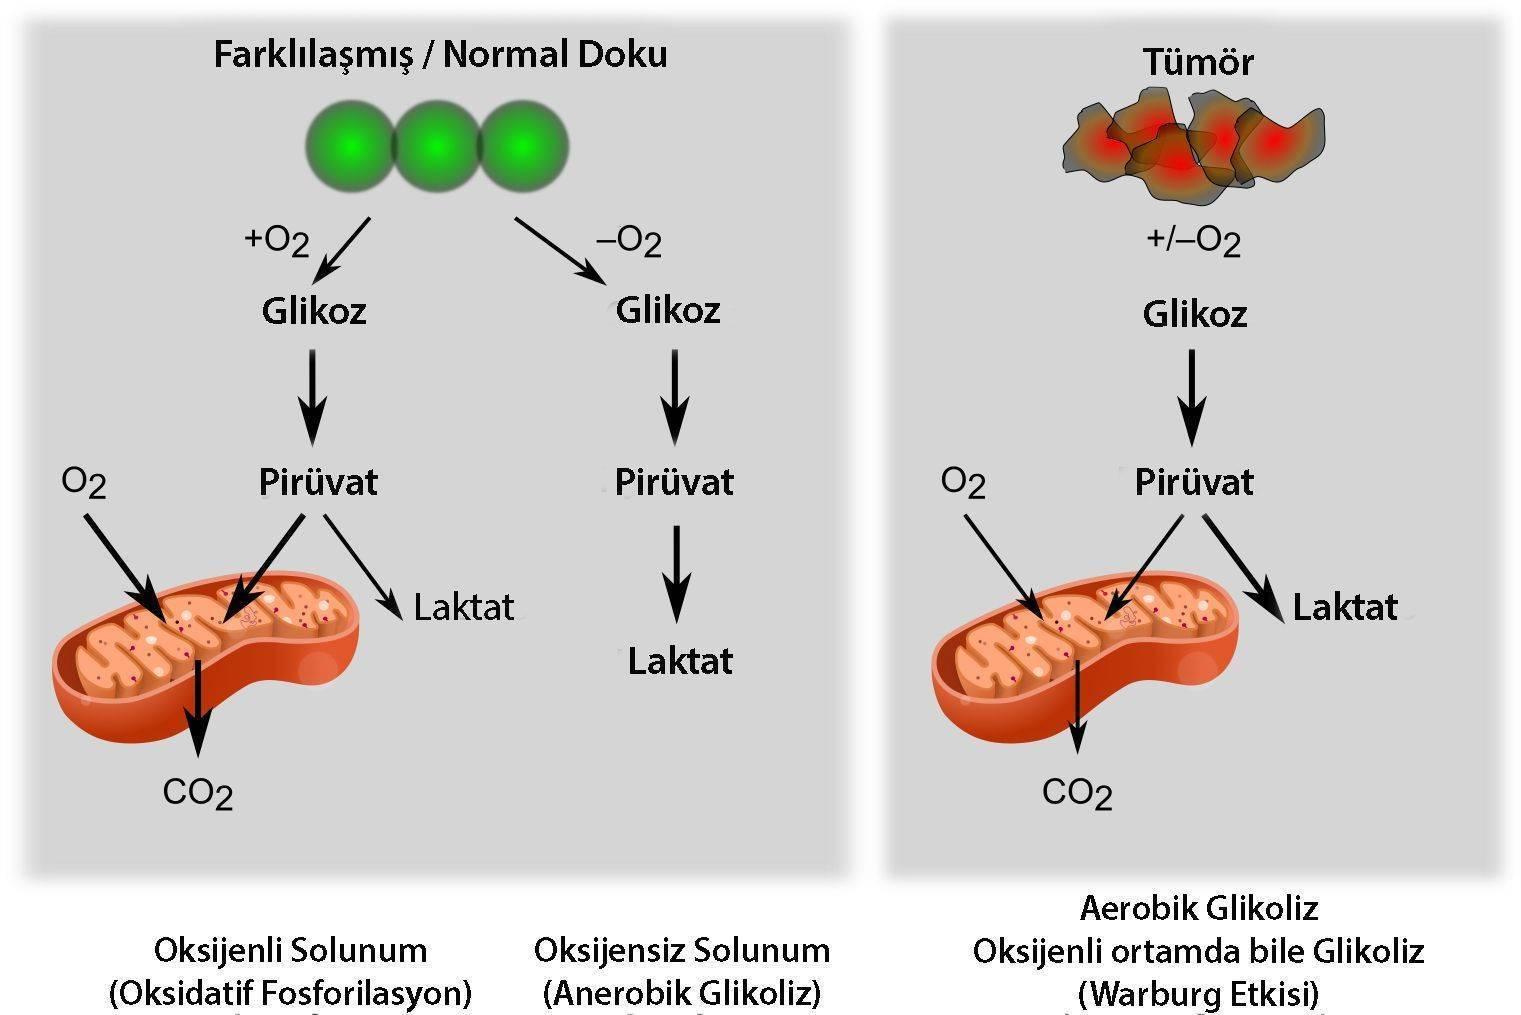 Warburg etkisi kanser oksijensiz ortam glikoliz alkali tedavi